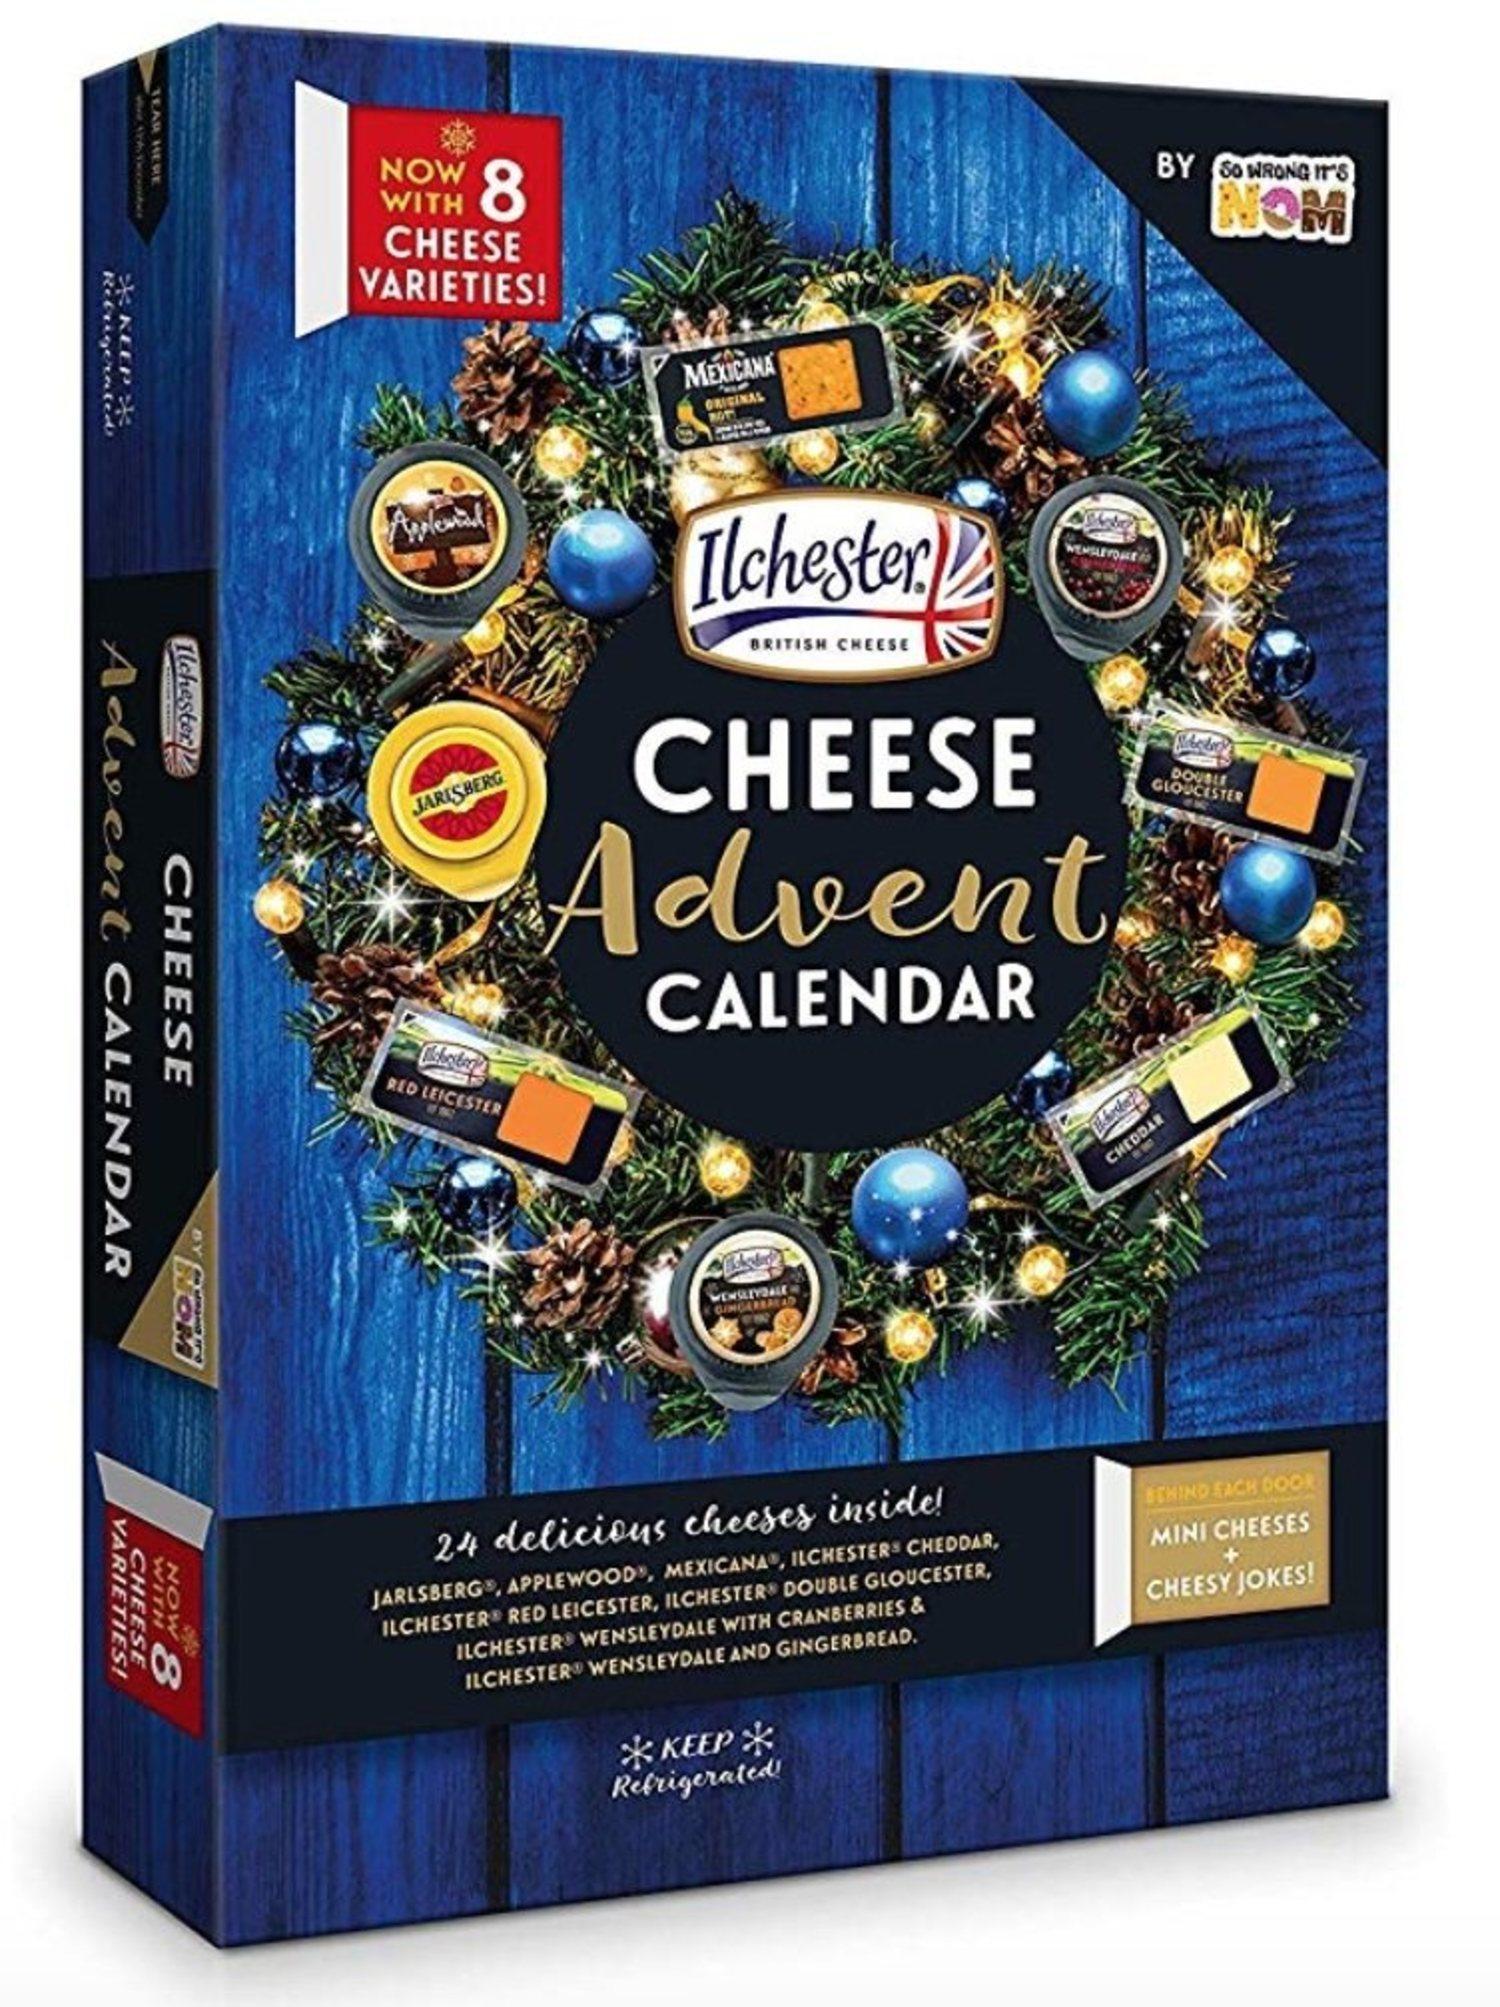 Calendario adviento de quesos.